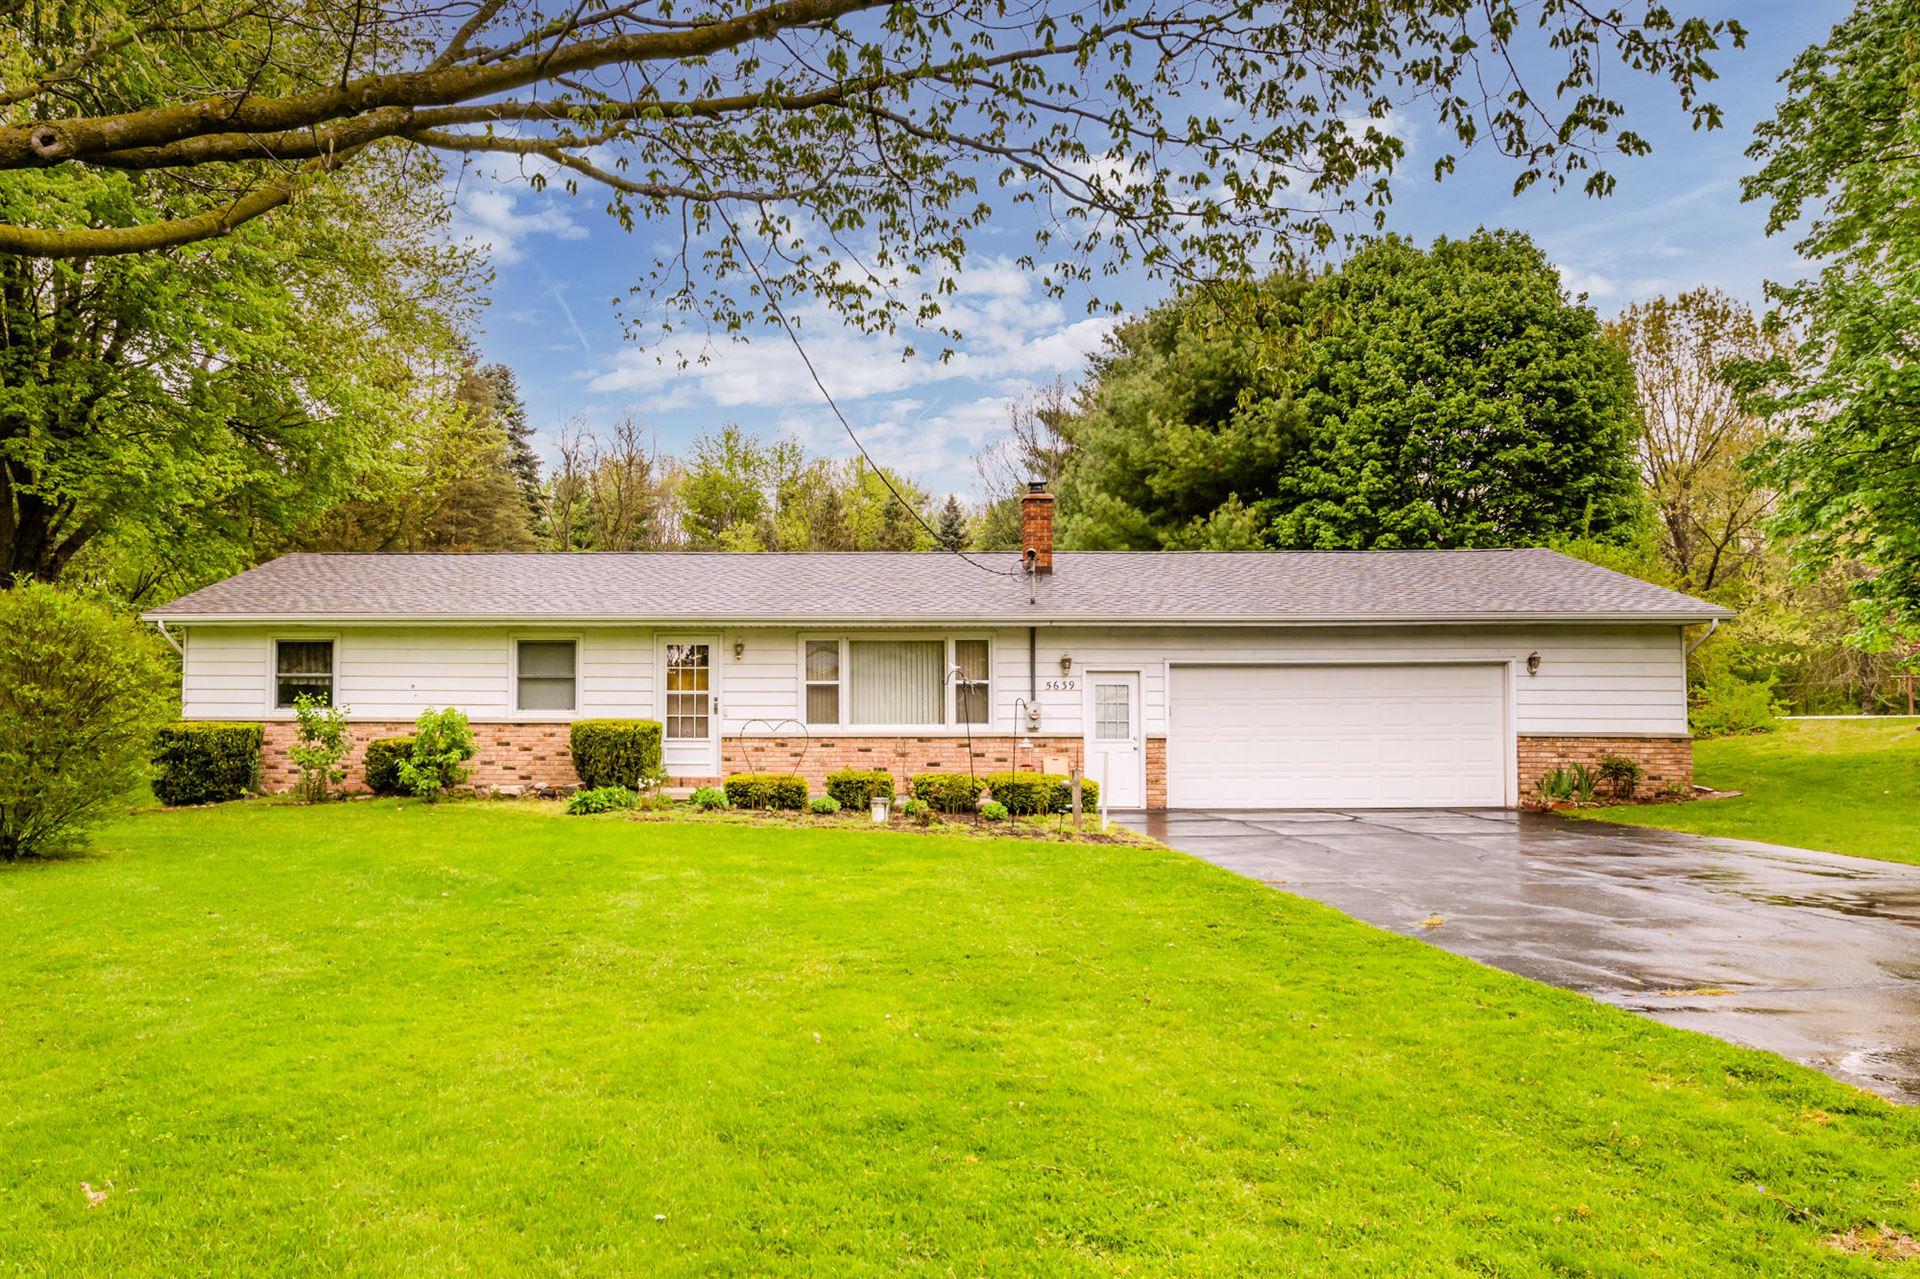 5639 Orchard Drive, Berrien Springs, MI 49103 - MLS#: 21015914